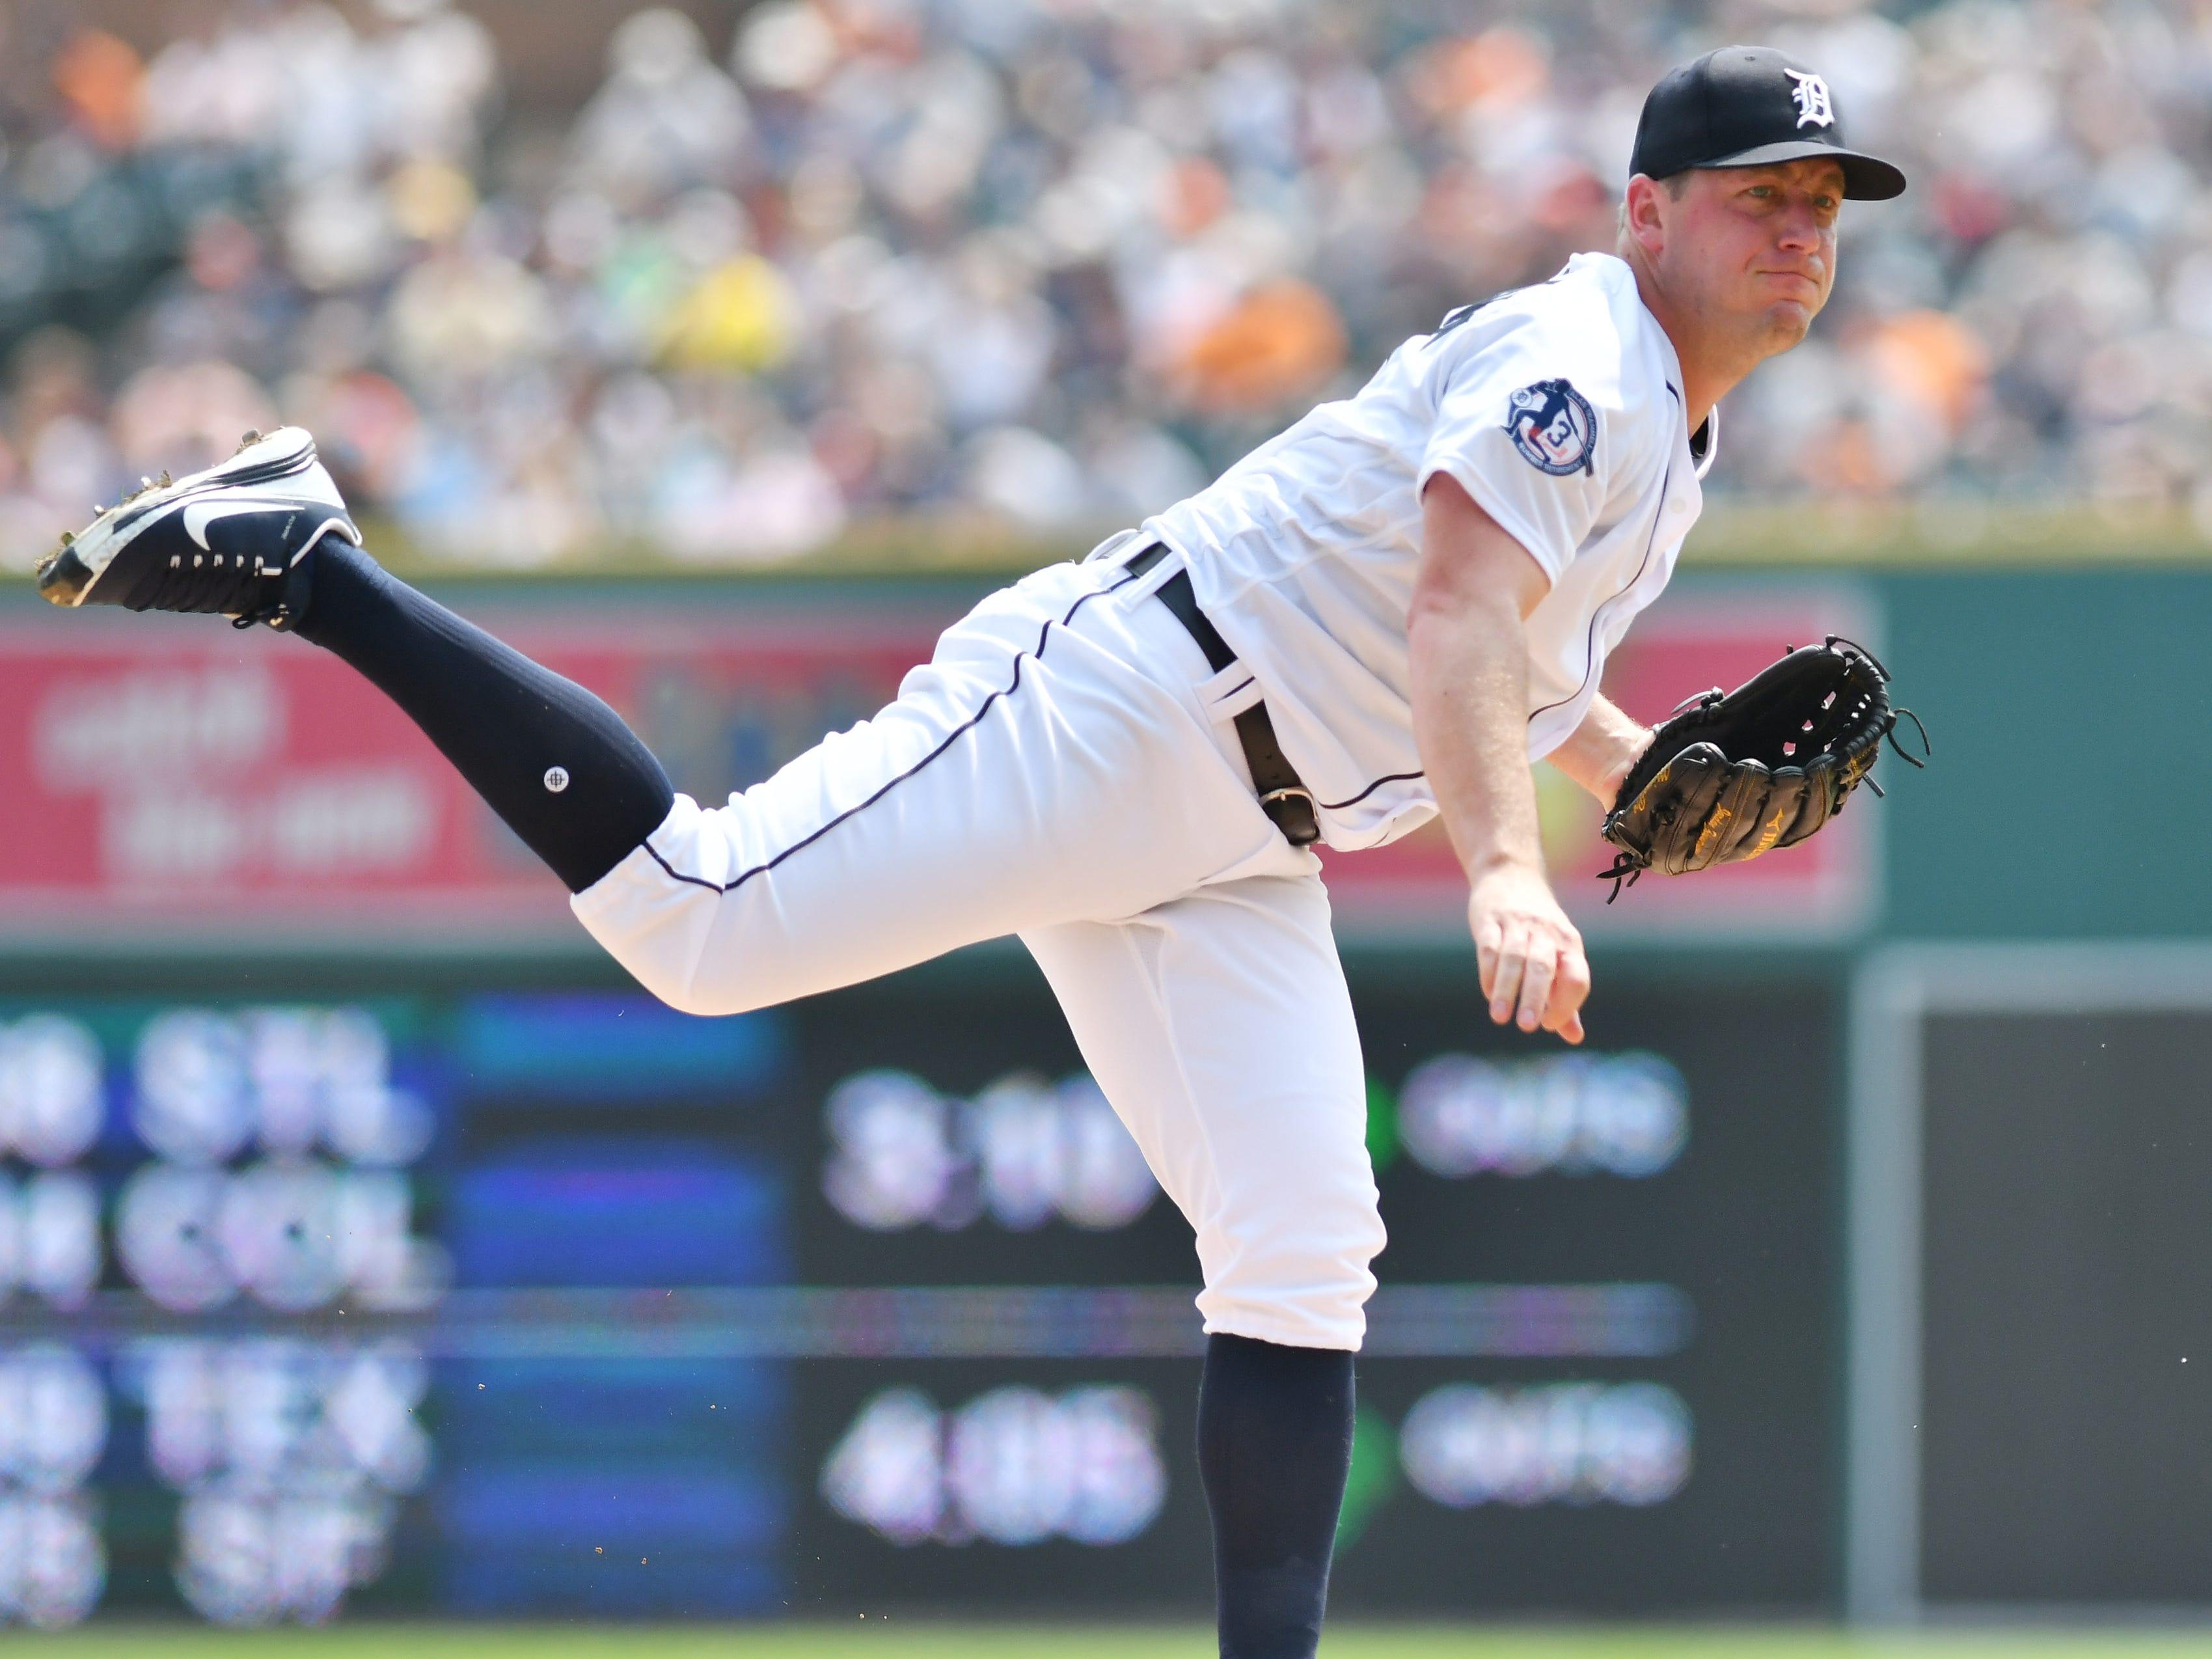 Tigers starting pitcher Jordan Zimmermann works in the third inning.